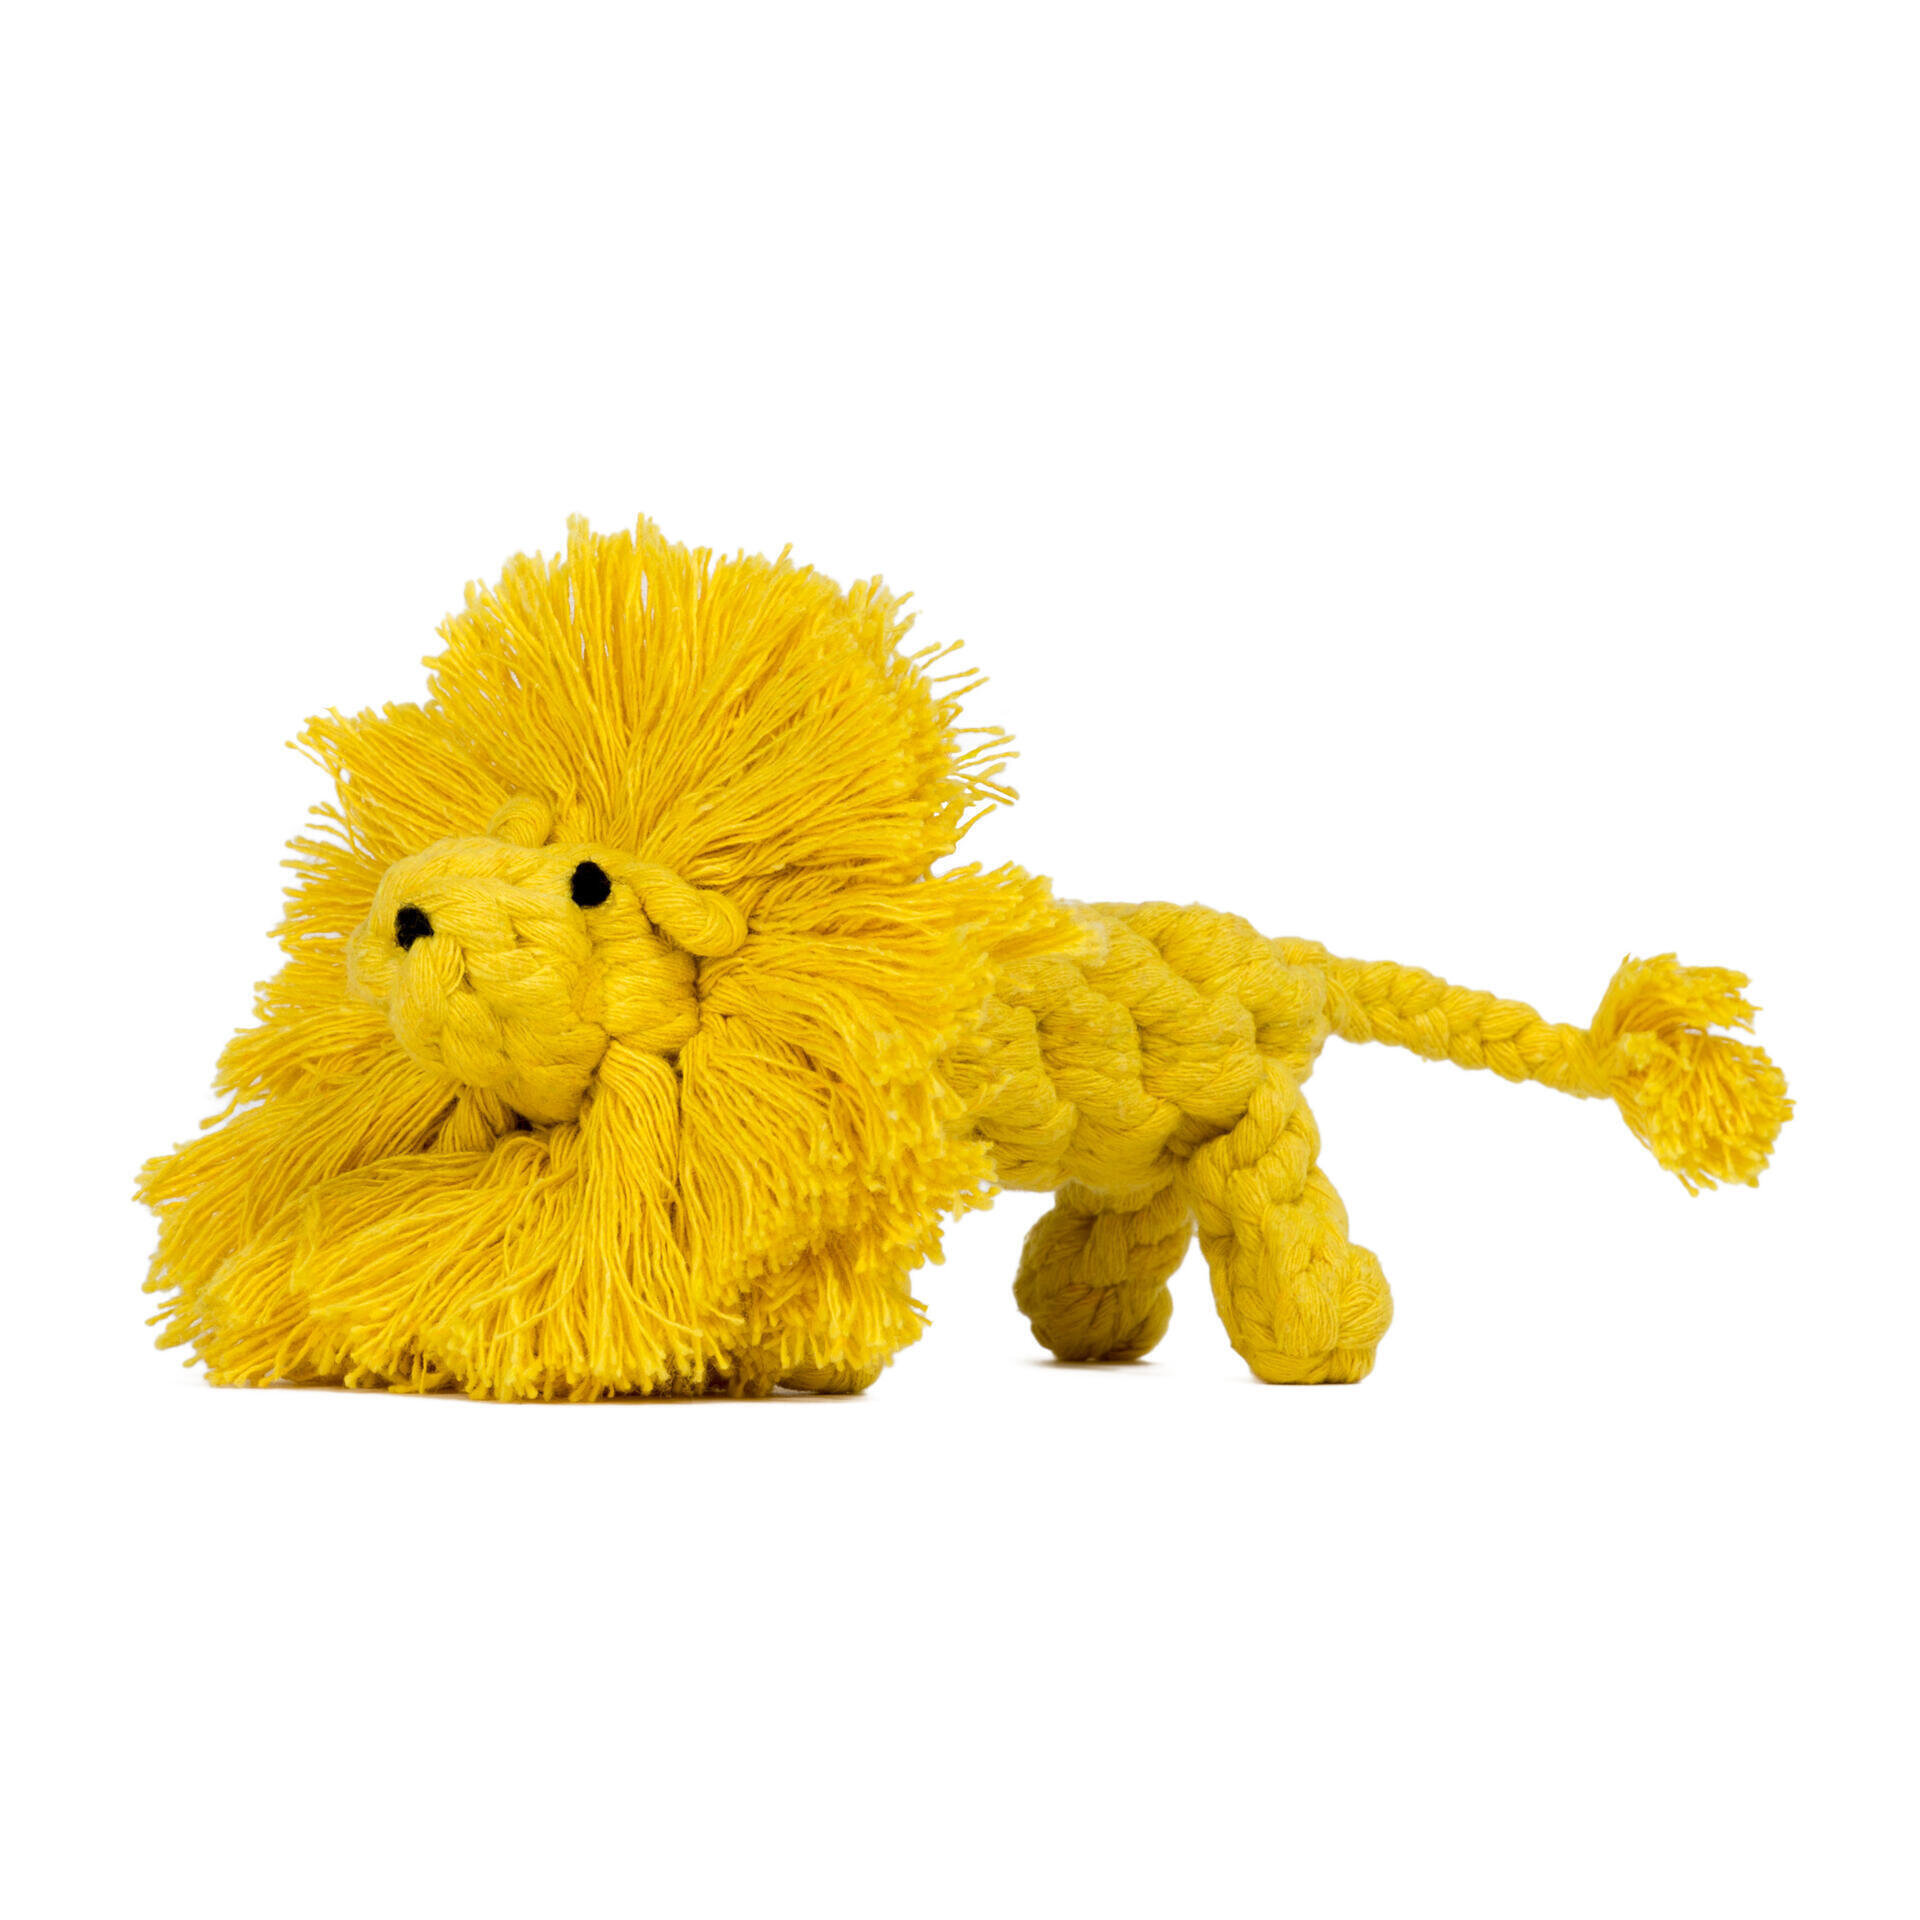 Leo Löwe - Kult-Spielzeug für Hunde